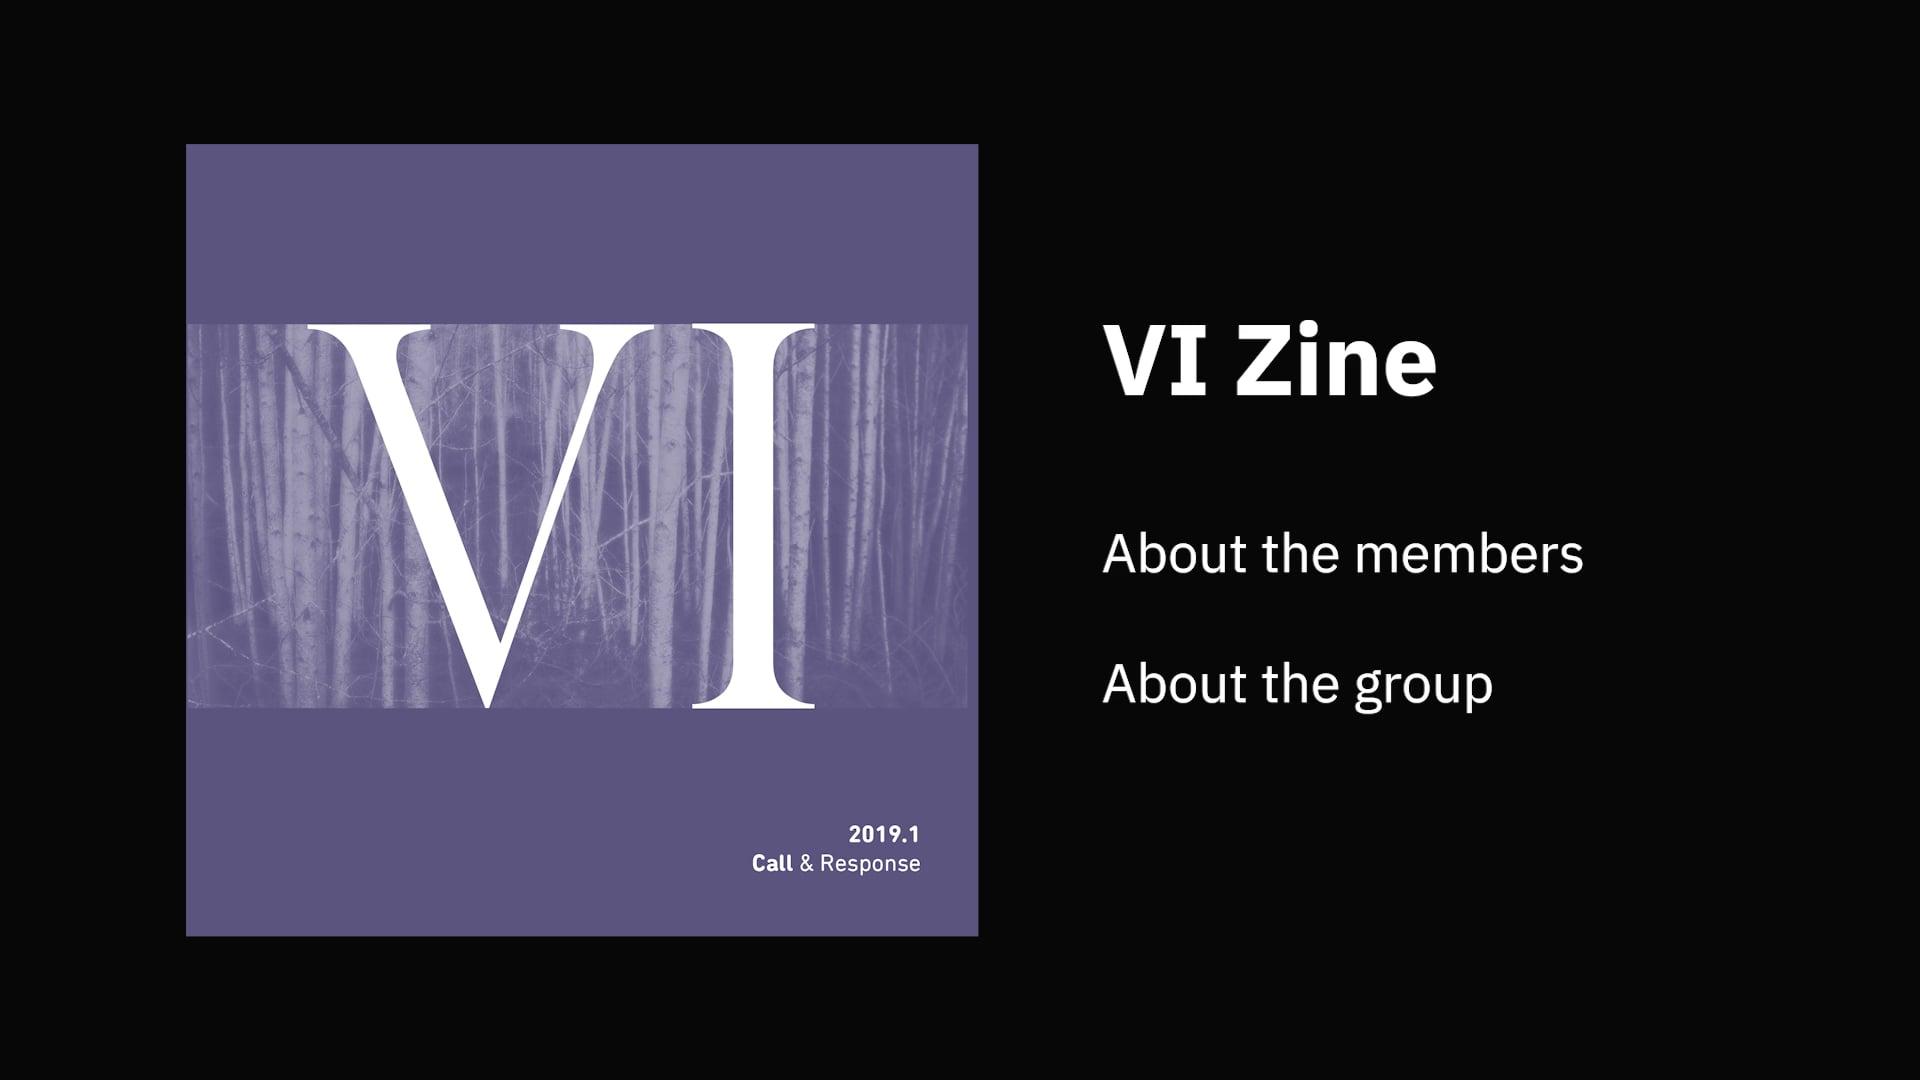 About VI Zine